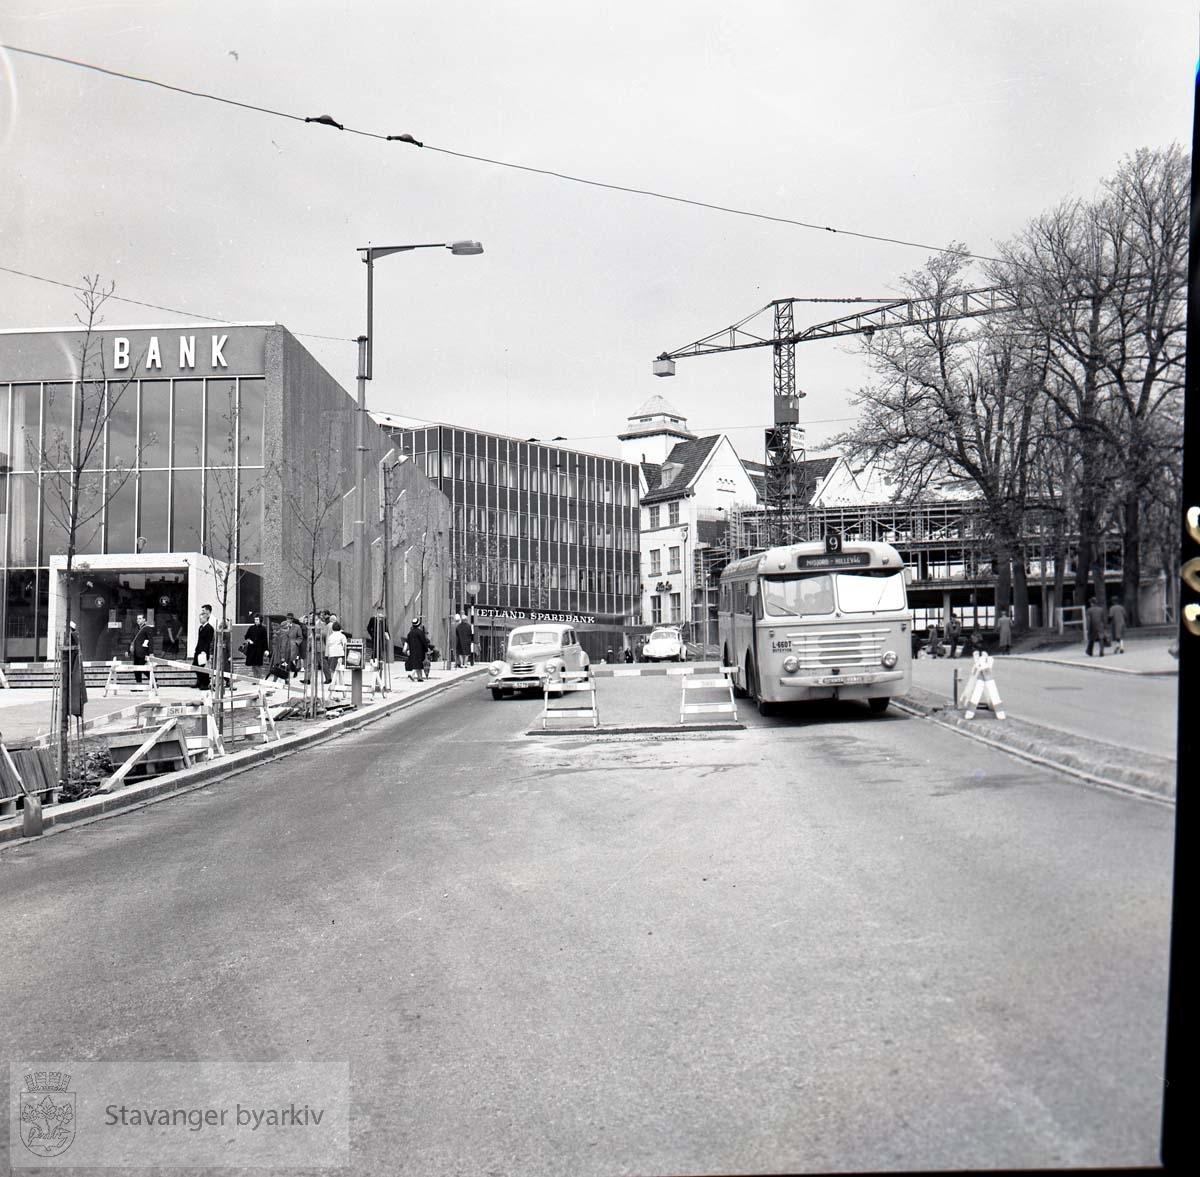 Anleggsarbeid. Norges Bank under oppføring. Stavanger Sparekasse, Hetland Sparebank. Buss nr 9 Mariero-Hillevåg i gaten.